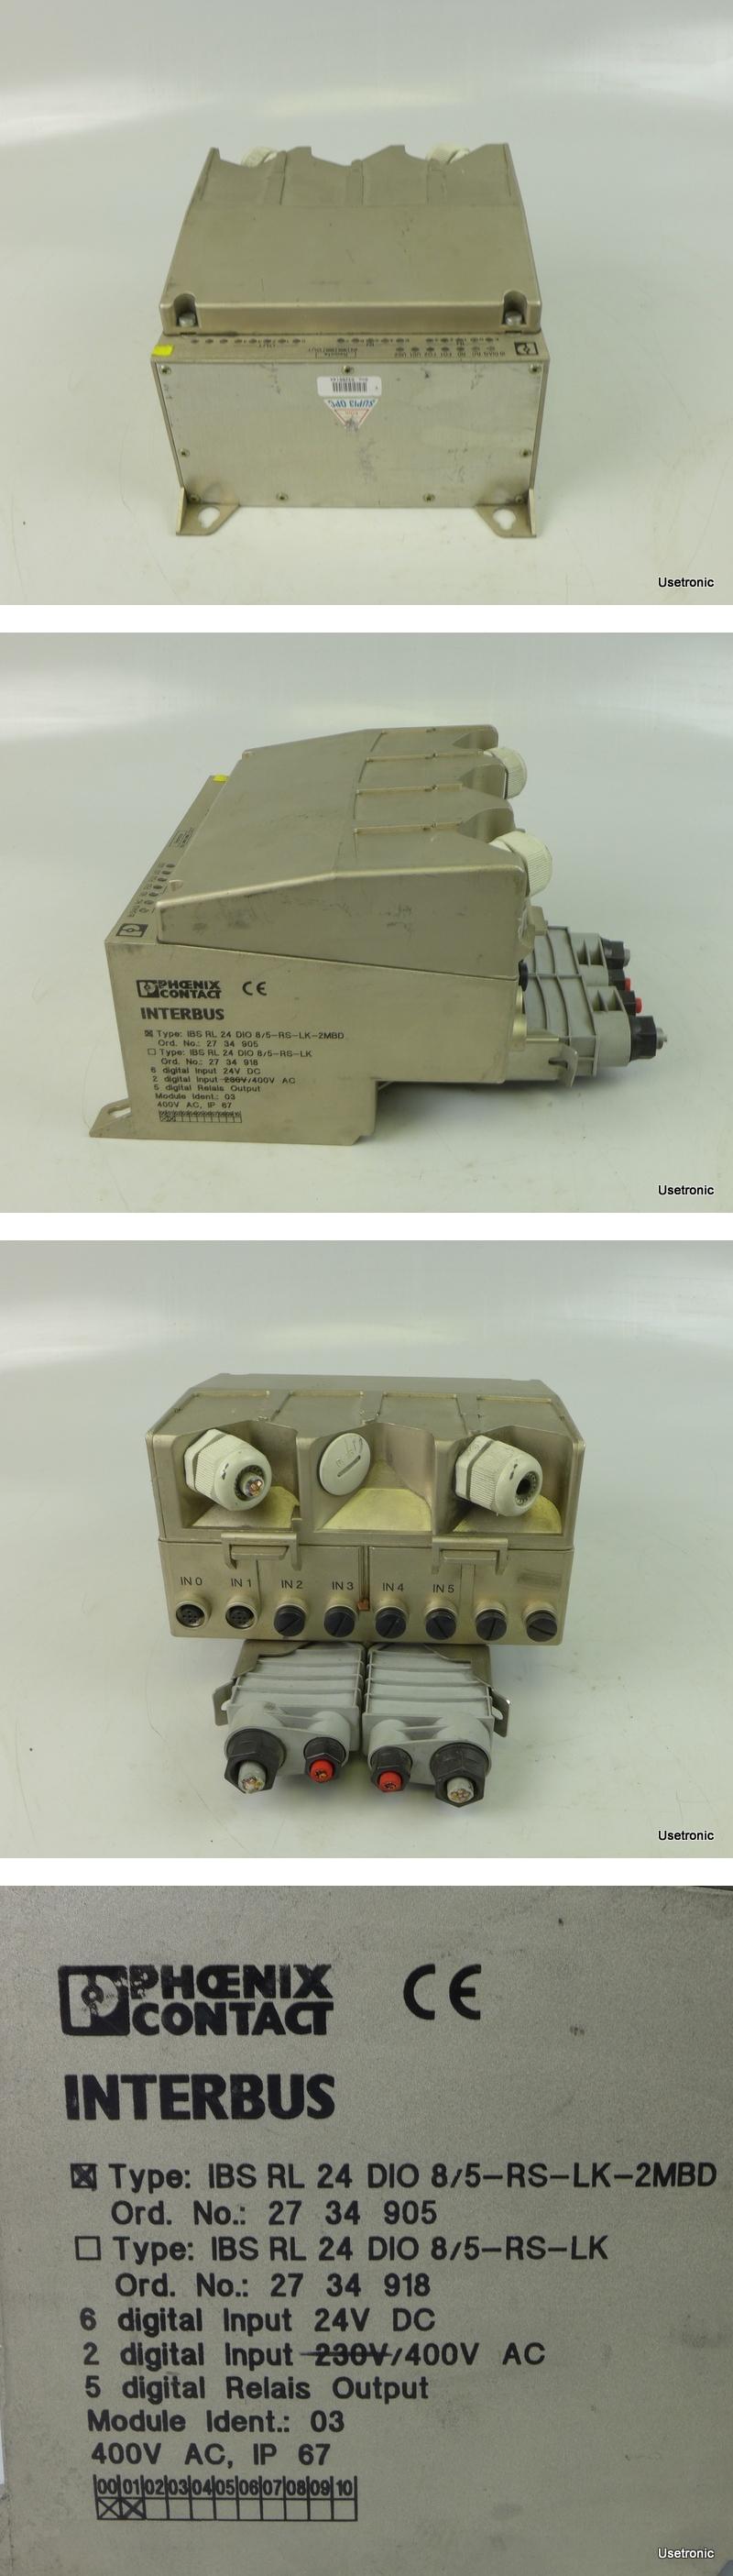 Phoenix Contact IBS RL 24 DIO 8/5-RS-LK-2MBD